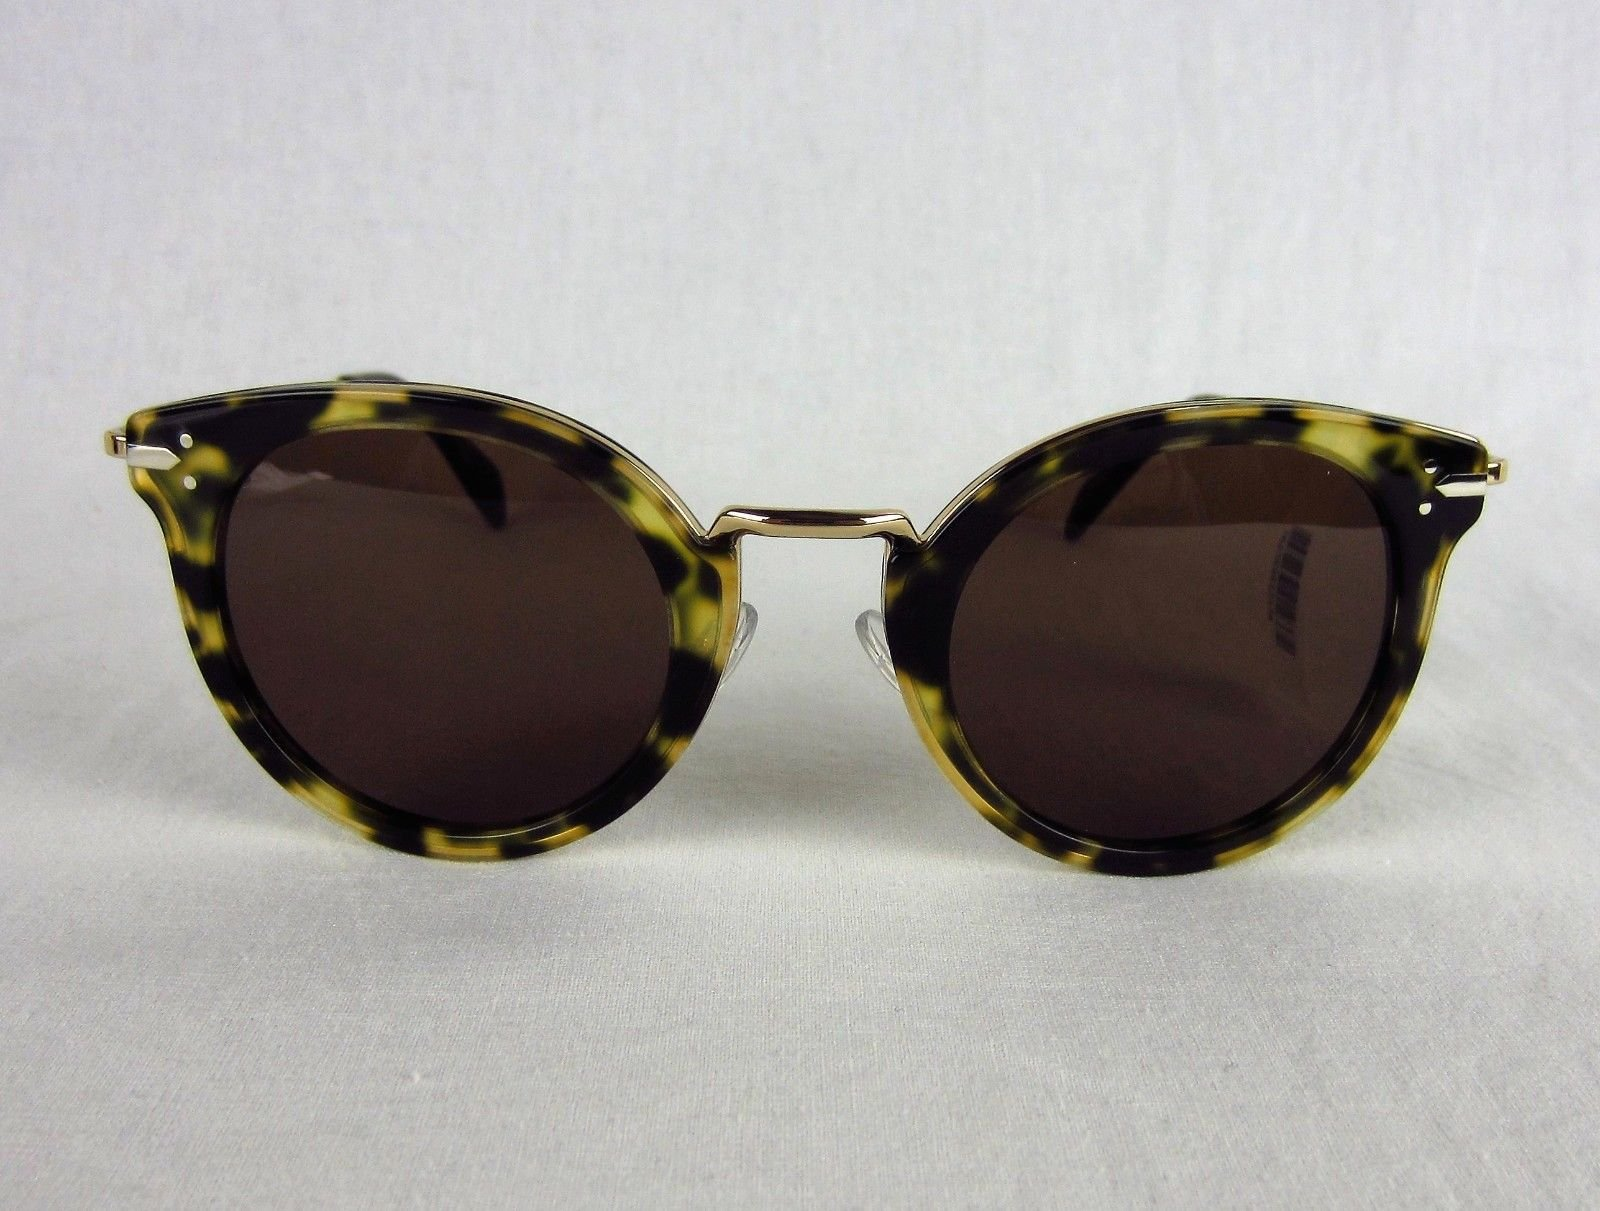 fb8a093efcb1 Details about NWT Celine Lea 41373 S J1L-A6 Green Havana Tortoise Round  Sunglasses Retro  485